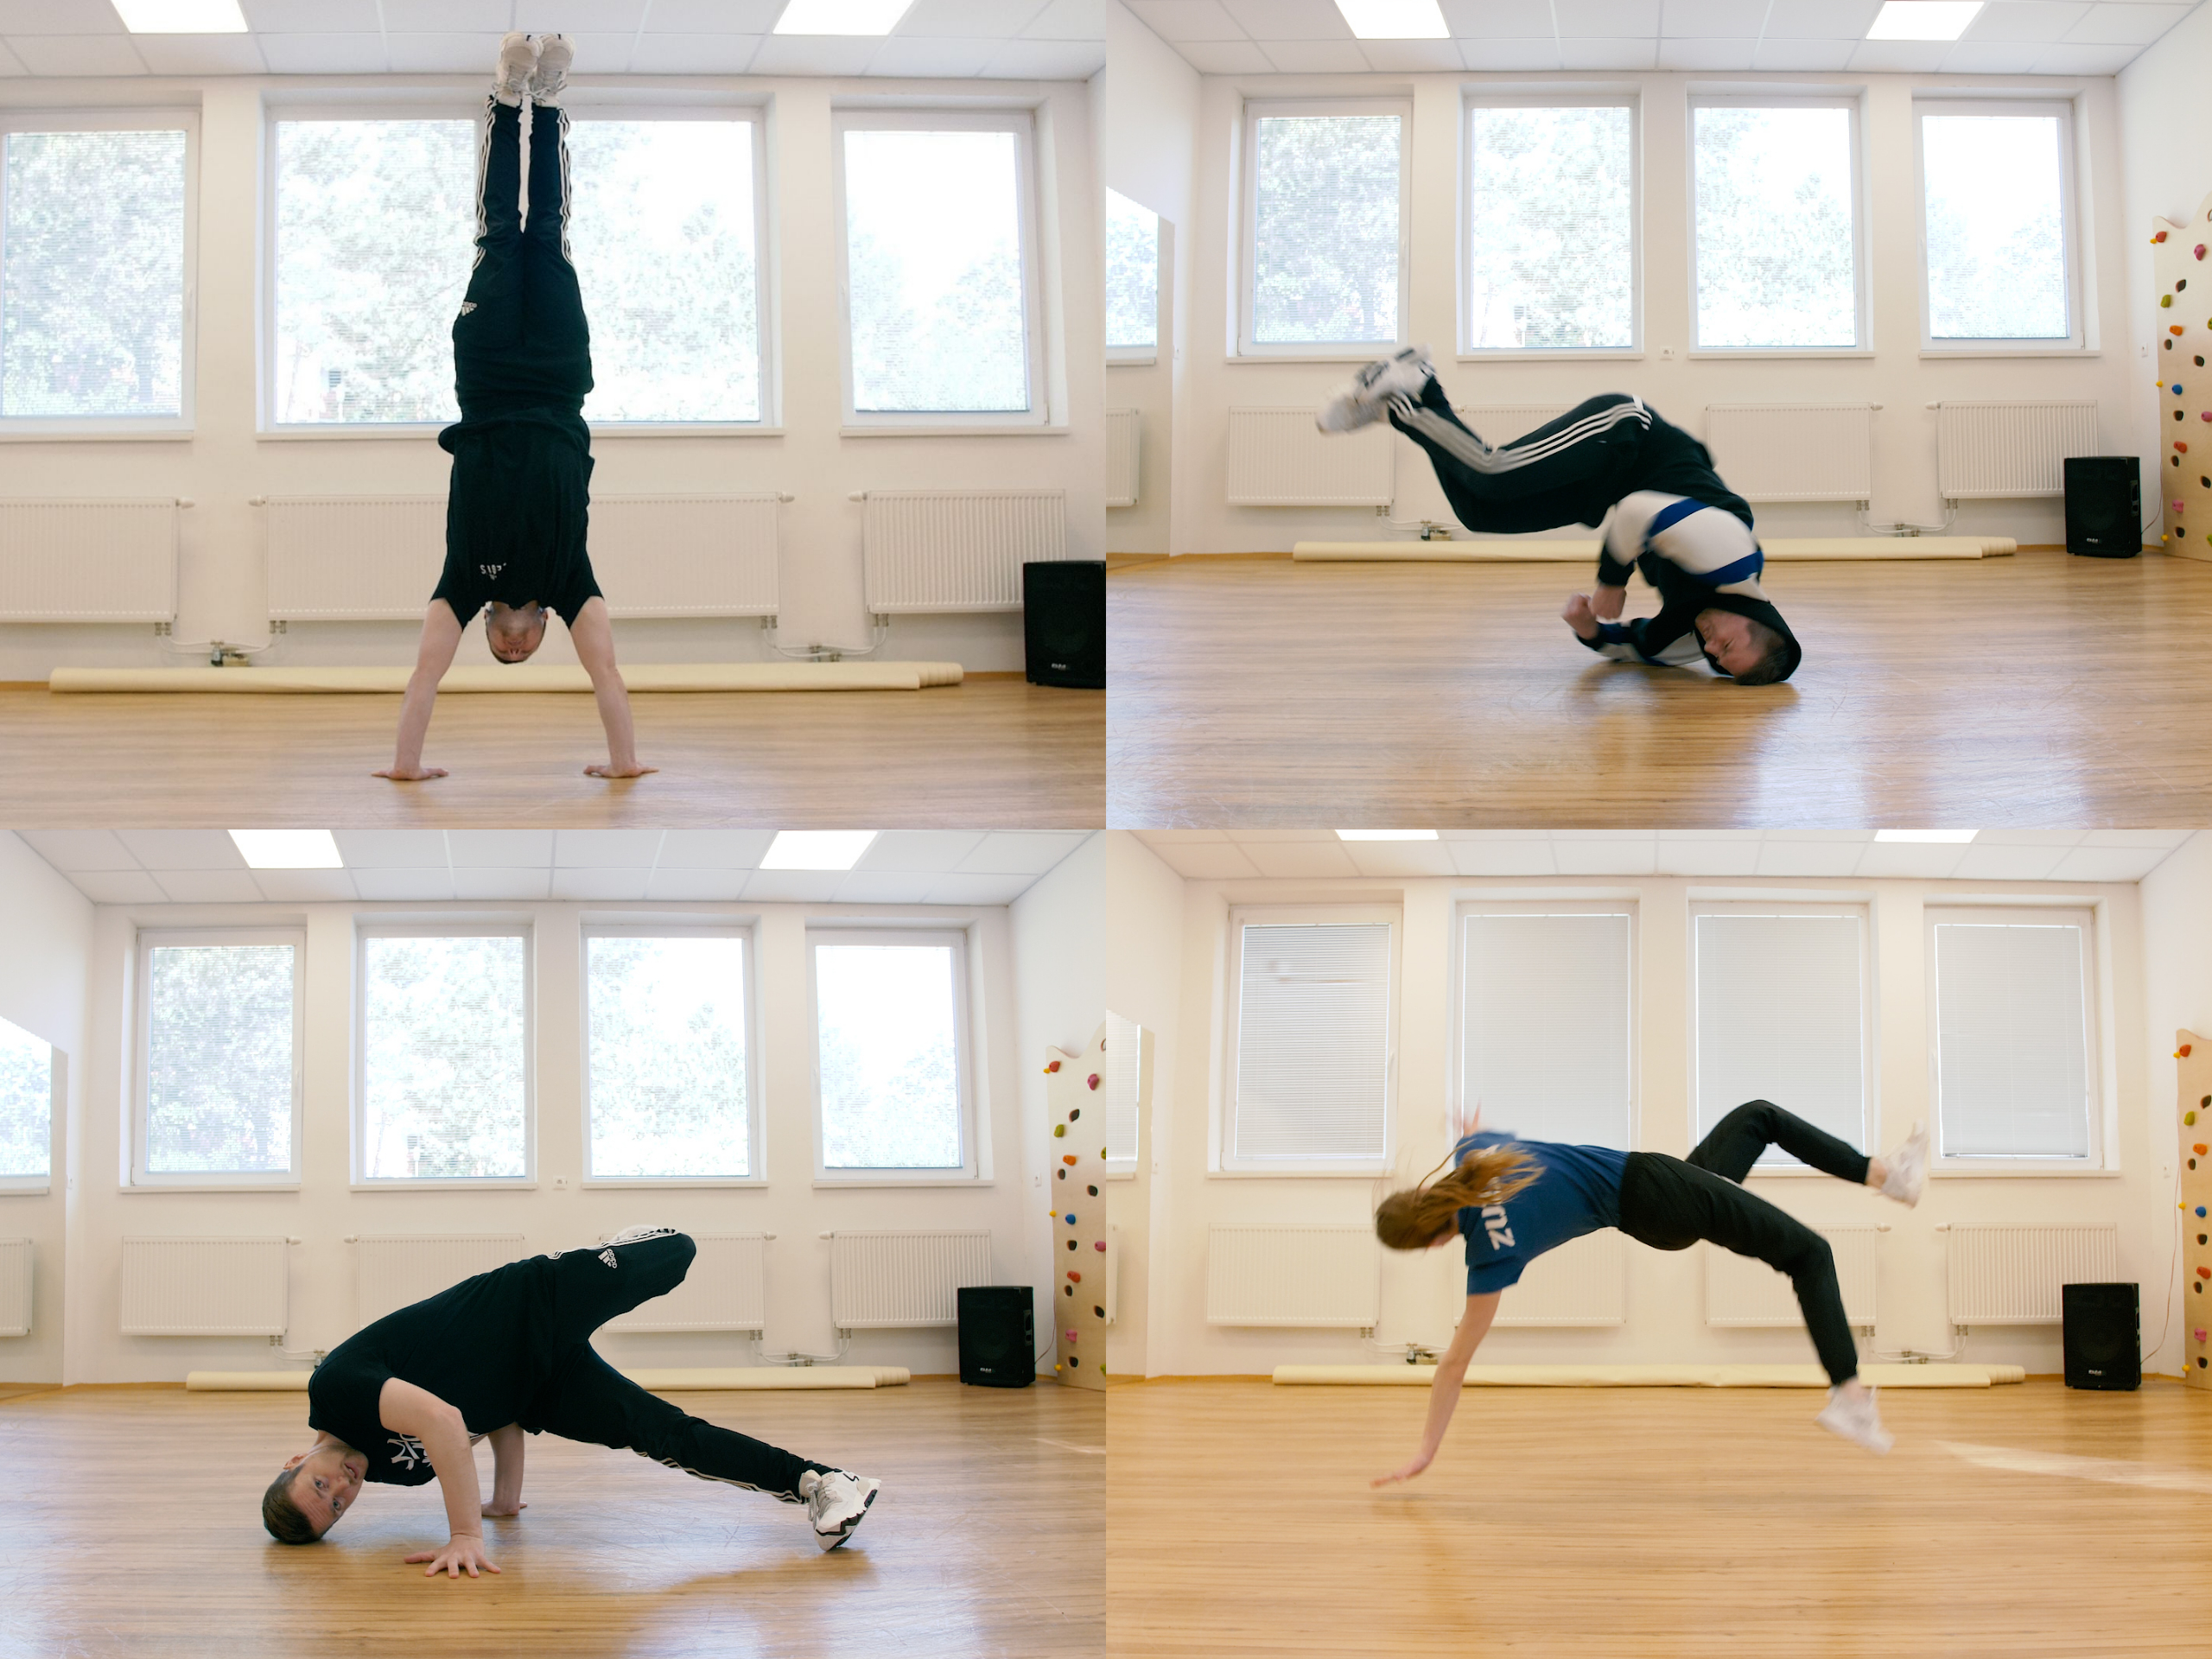 skola_breaku_tutorial_ako_sa_naucit_breakdance